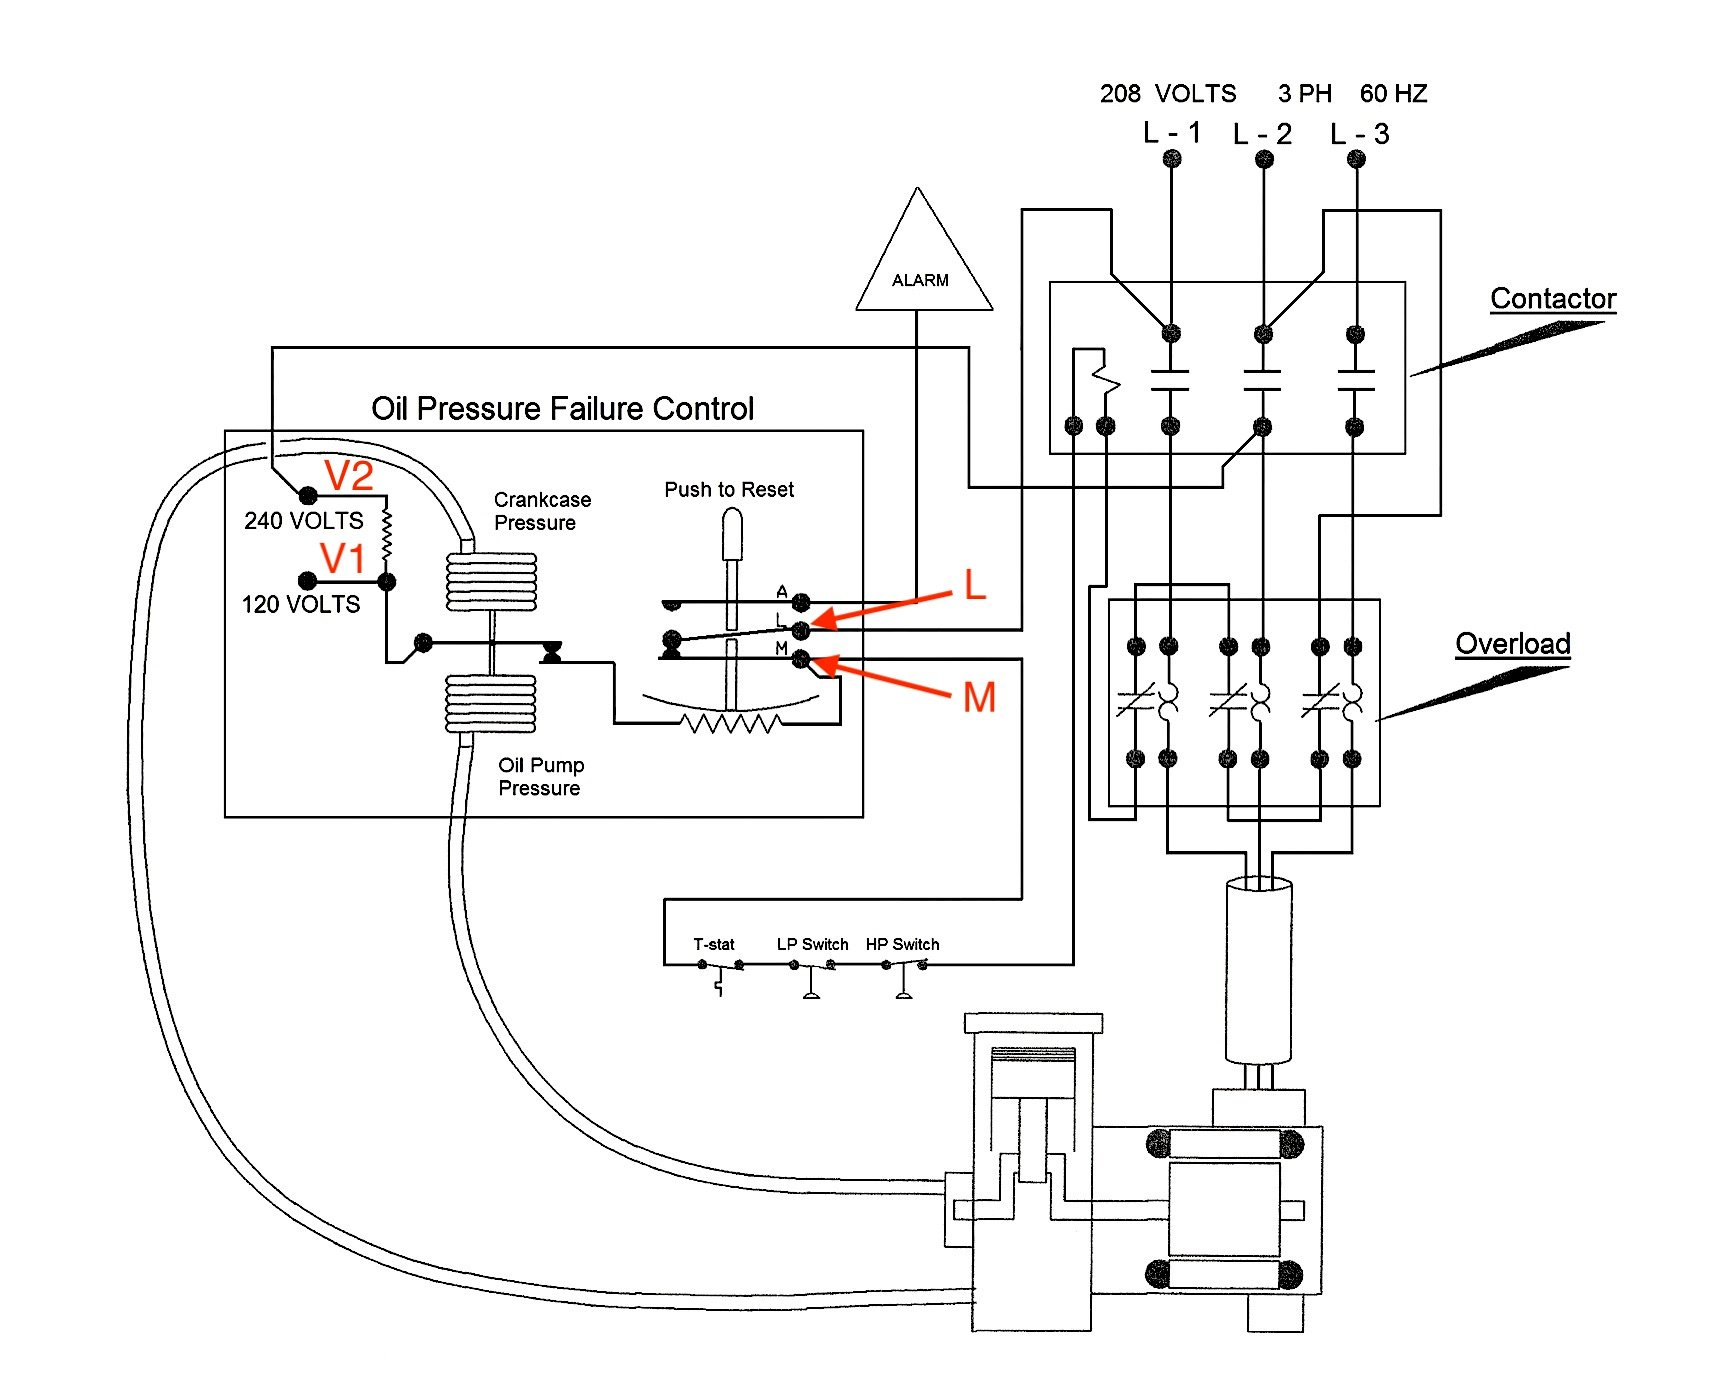 Diagram Icm Head Pressure Control Wiring Diagram Full Version Hd Quality Wiring Diagram Ductdiagram Eyepower It